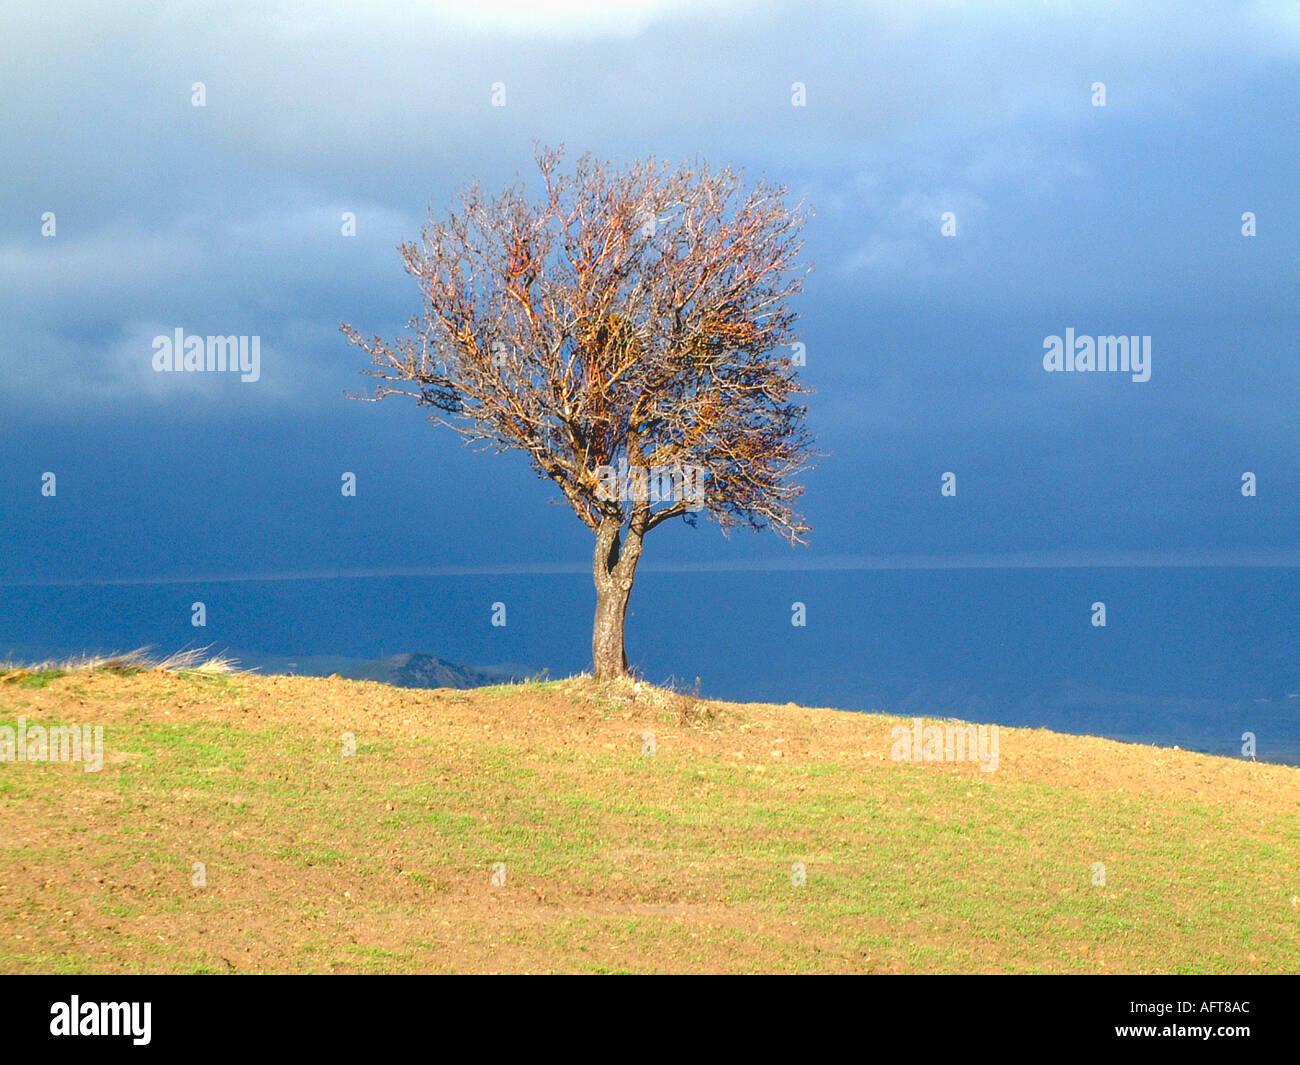 Tree overlooking the coast in Basilicata Italy - Stock Image